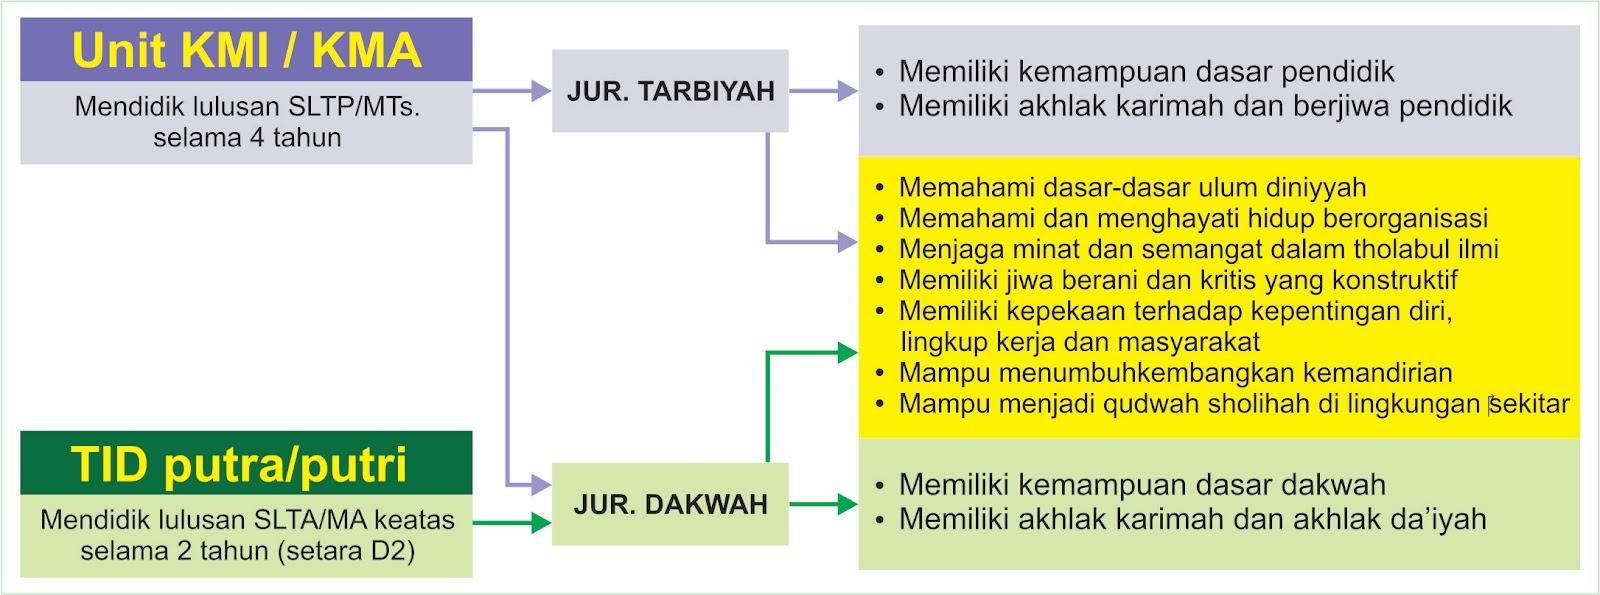 Jurusan dan target pendidikan.jpg